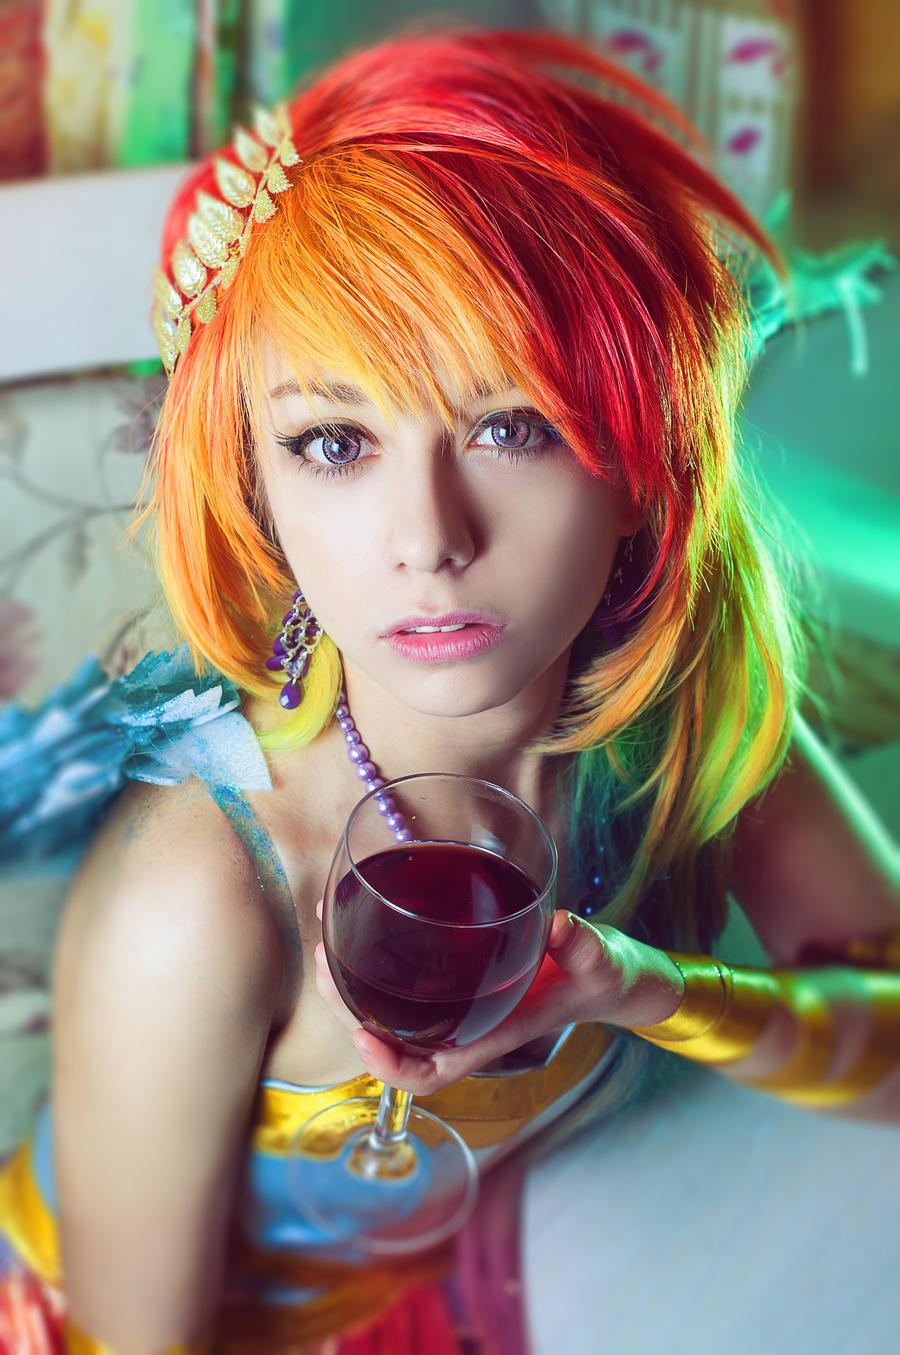 http://img09.deviantart.net/827f/i/2012/326/a/5/mlp_rainbow_dash_gala_cosplay_by_anima89-d5lt5fe.jpg